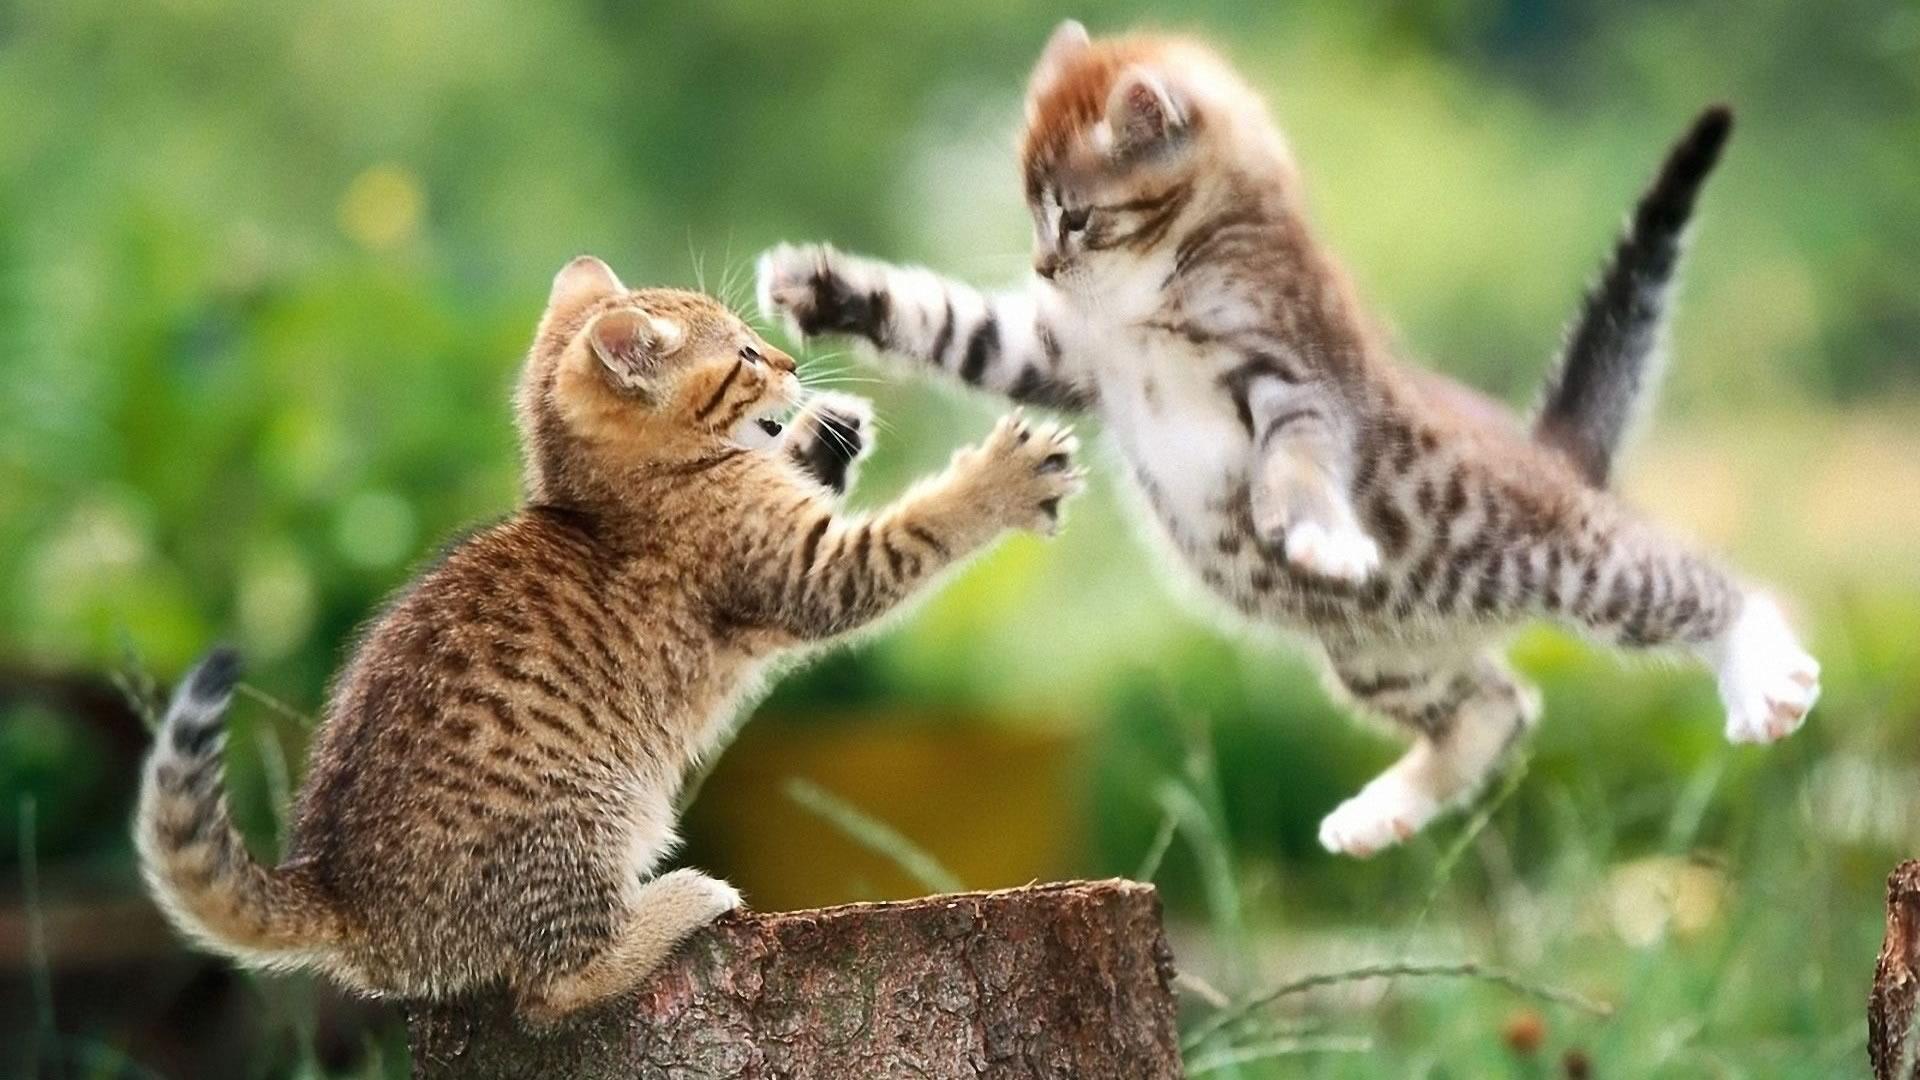 download wallpaper: spelende kittens wallpaper